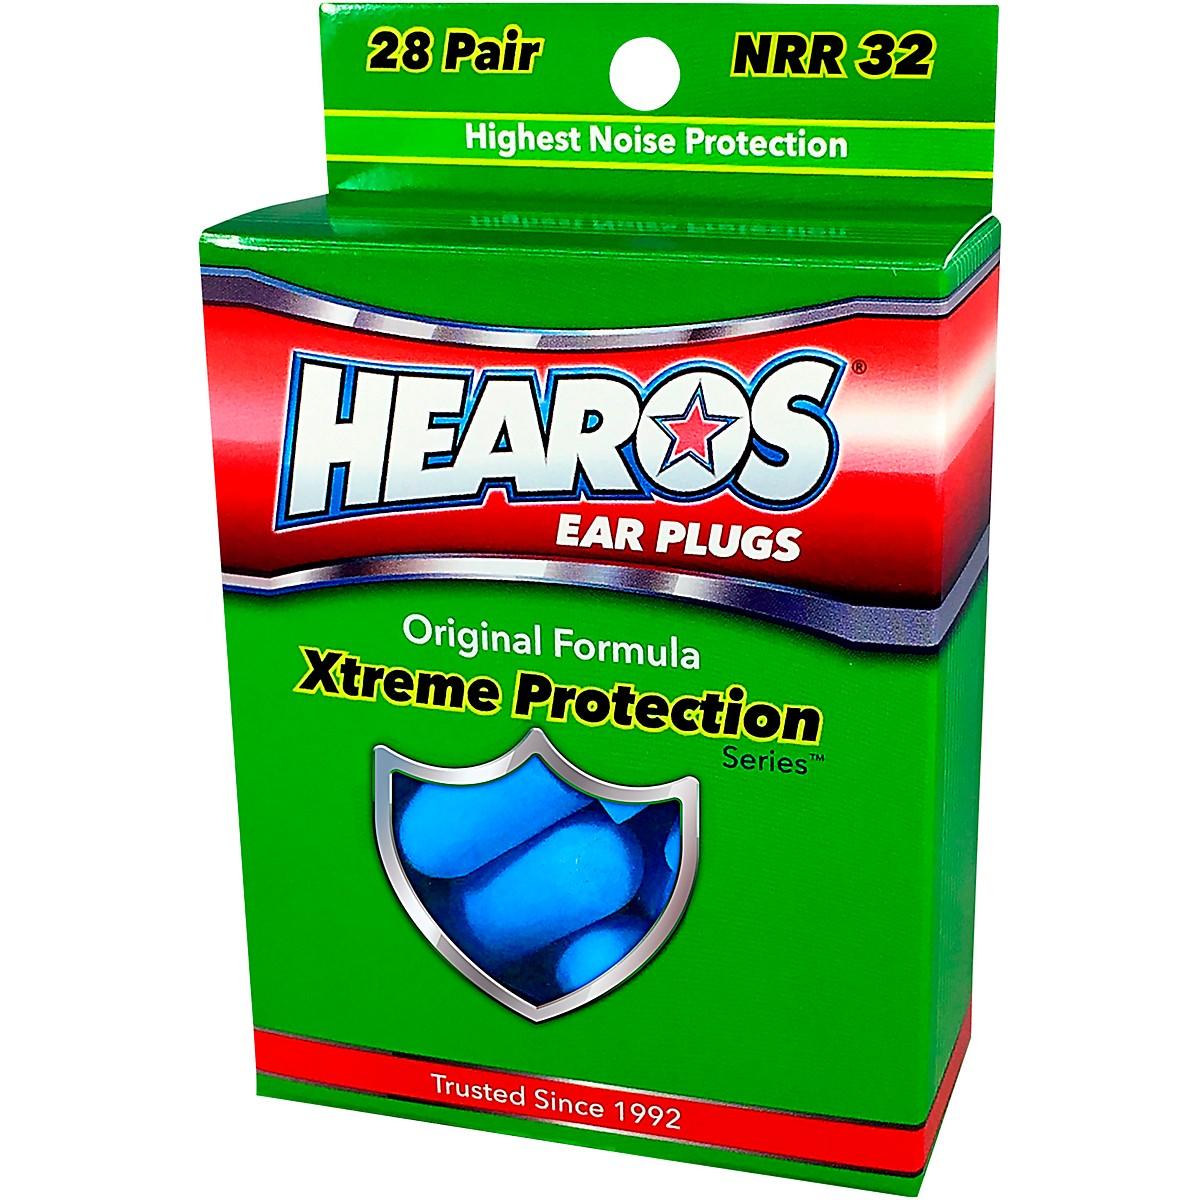 Hearos Xtreme Protection Series Ear Plugs 28 Pair